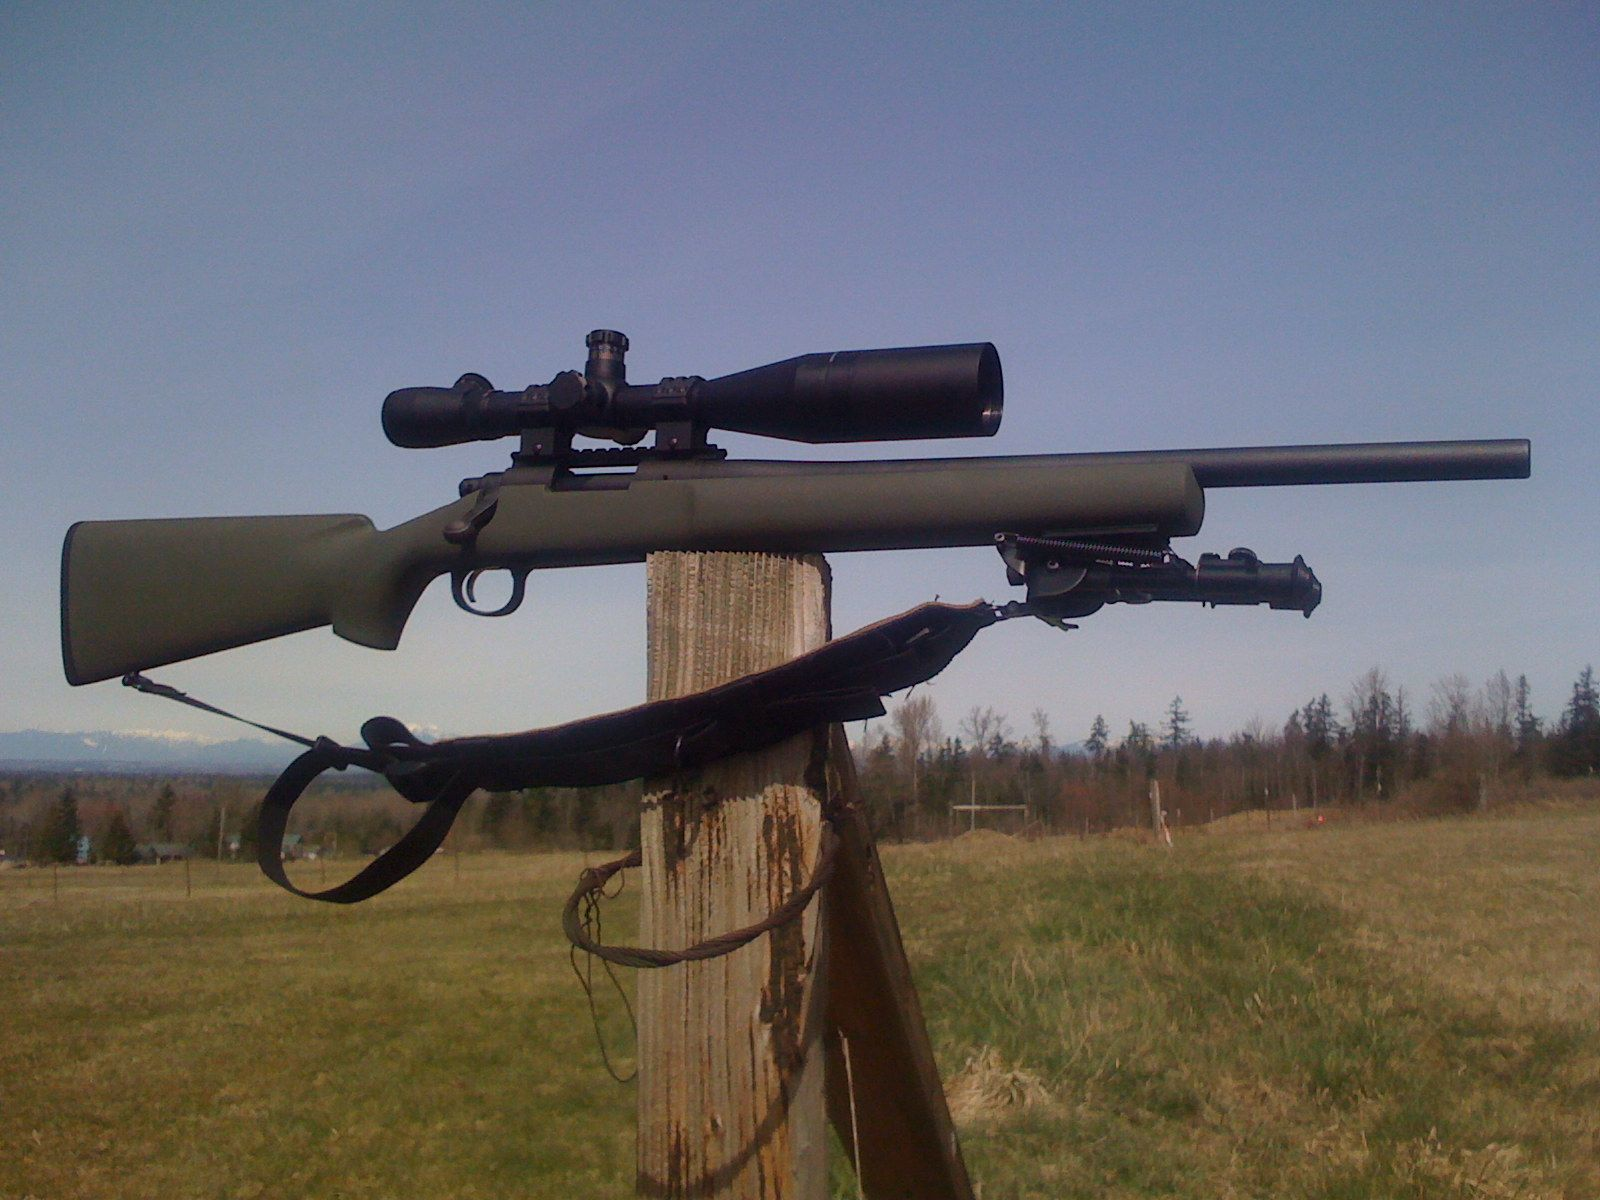 remington 700 sps tactical legunsales com firearms pinterest